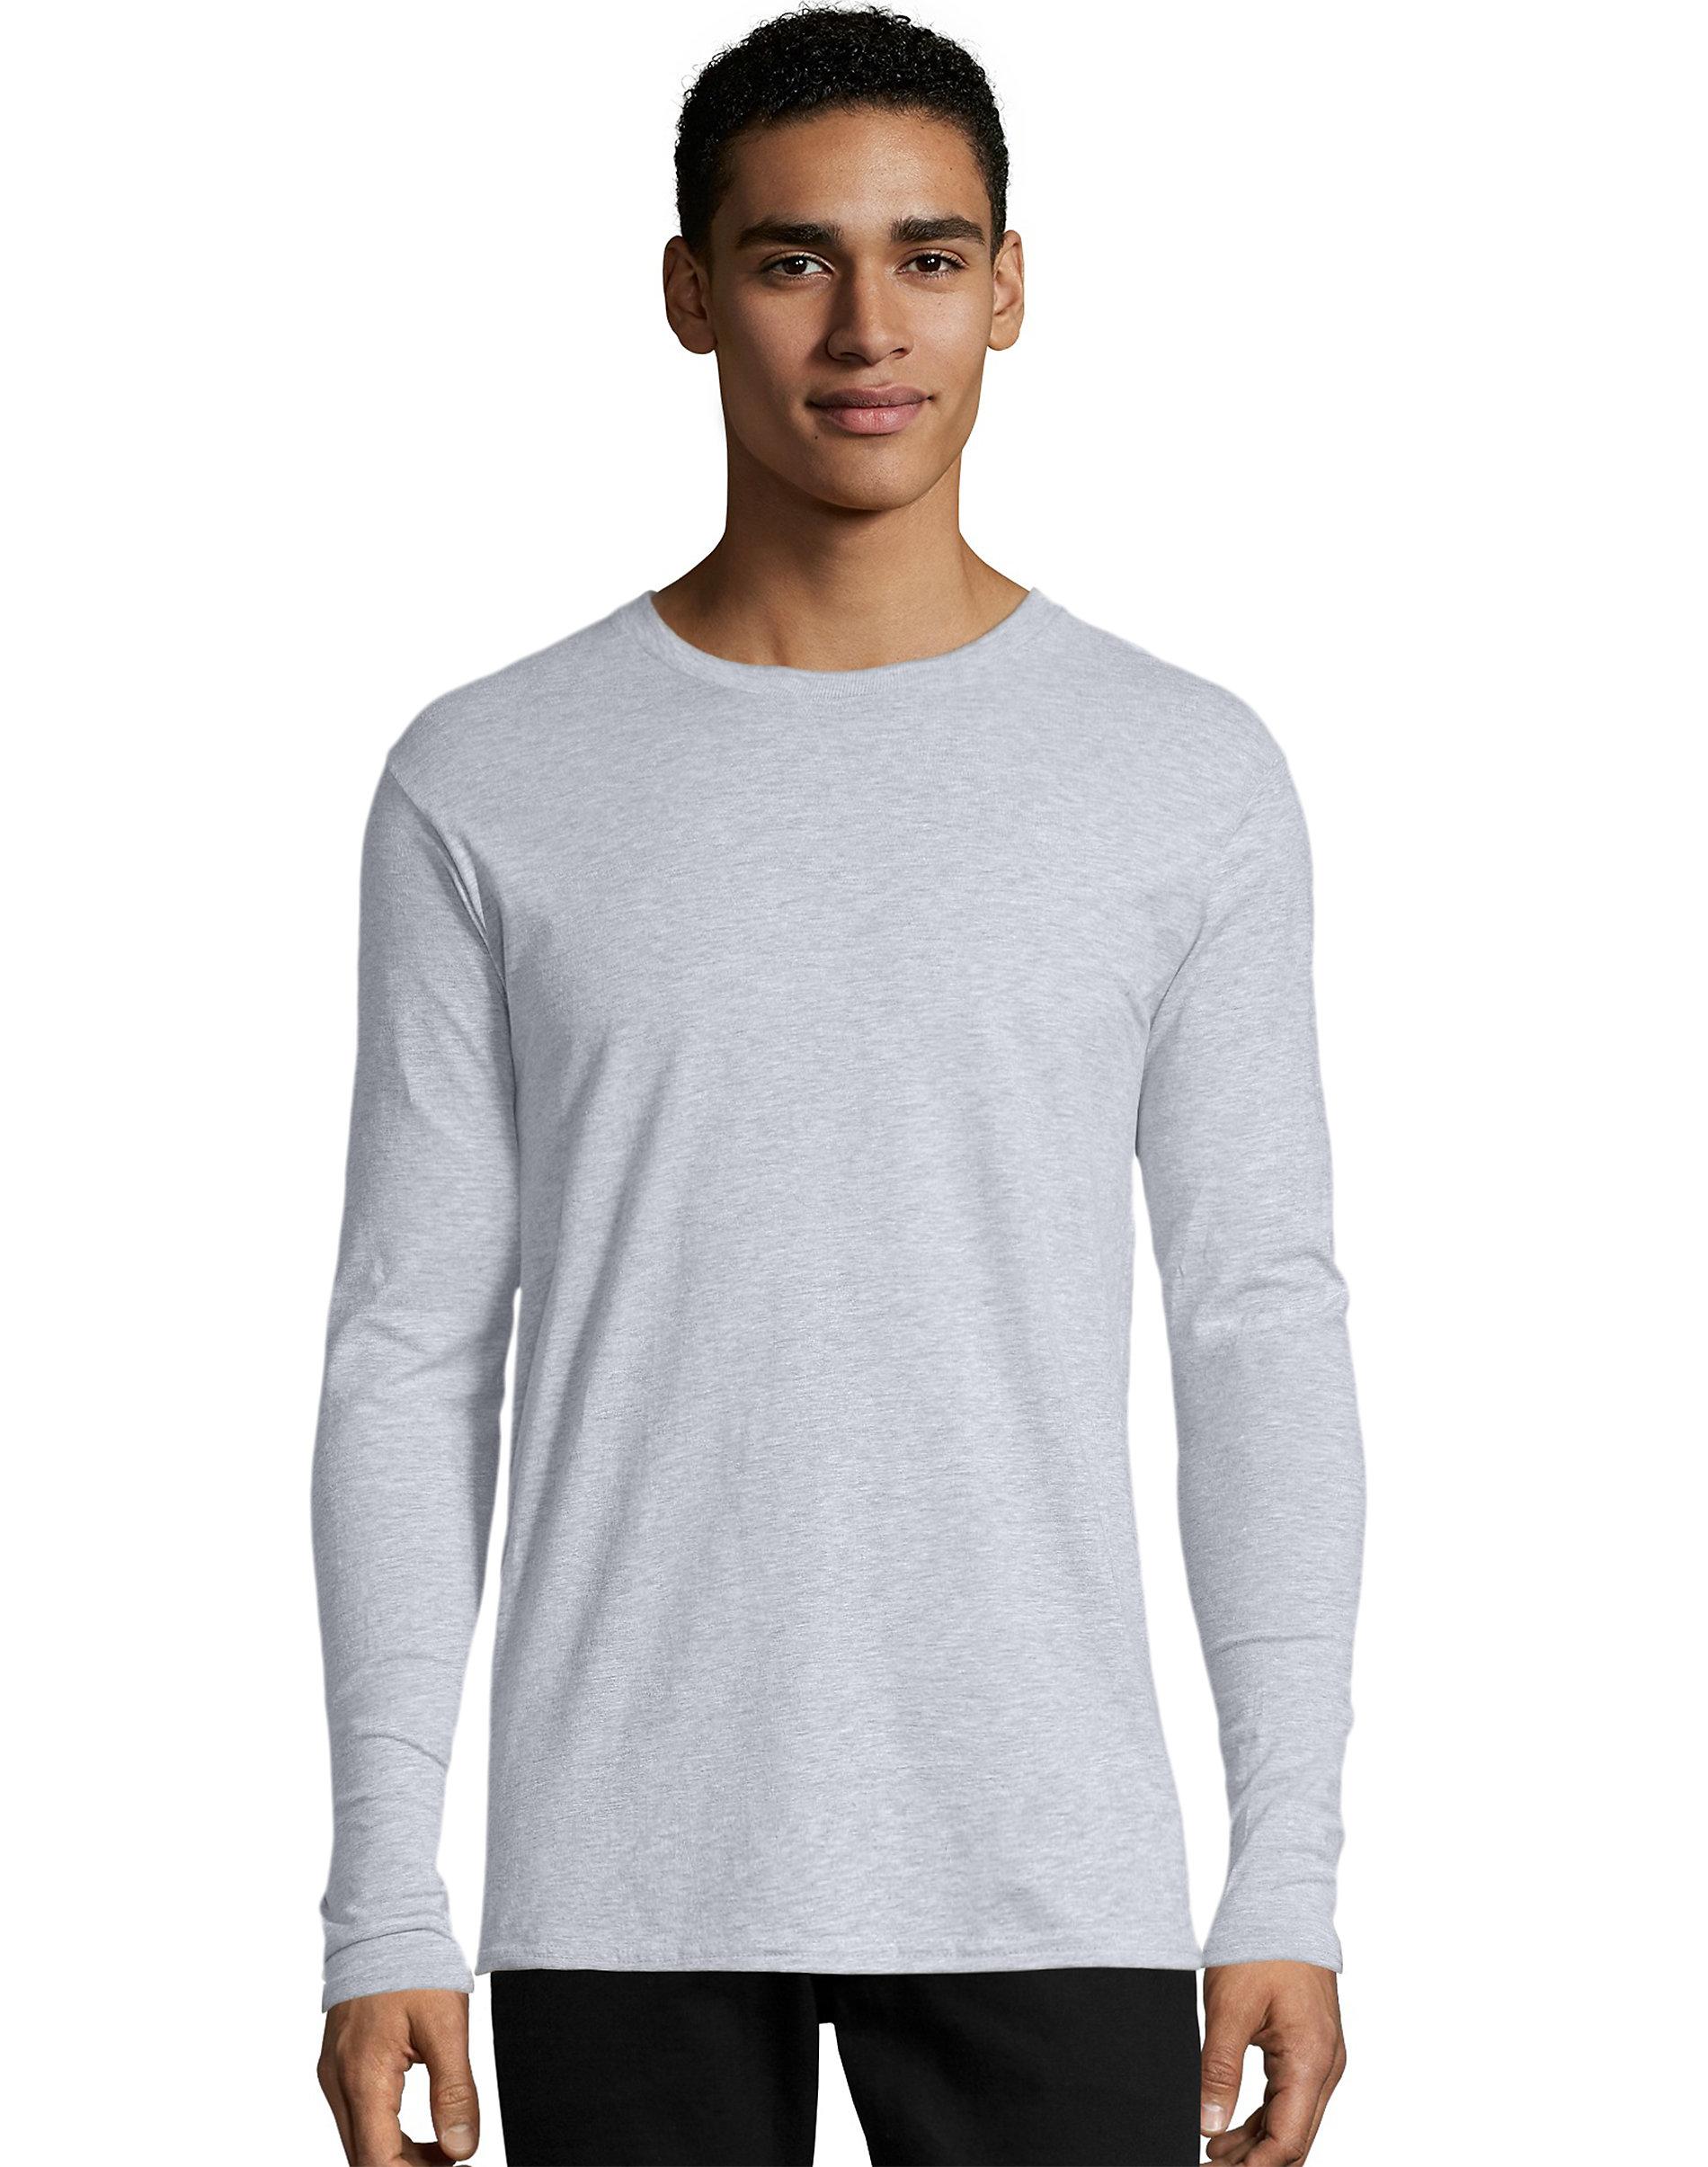 005e7740a45 Hanes Mens Long Sleeve Premium T Shirt (pack Of 2) – DACC